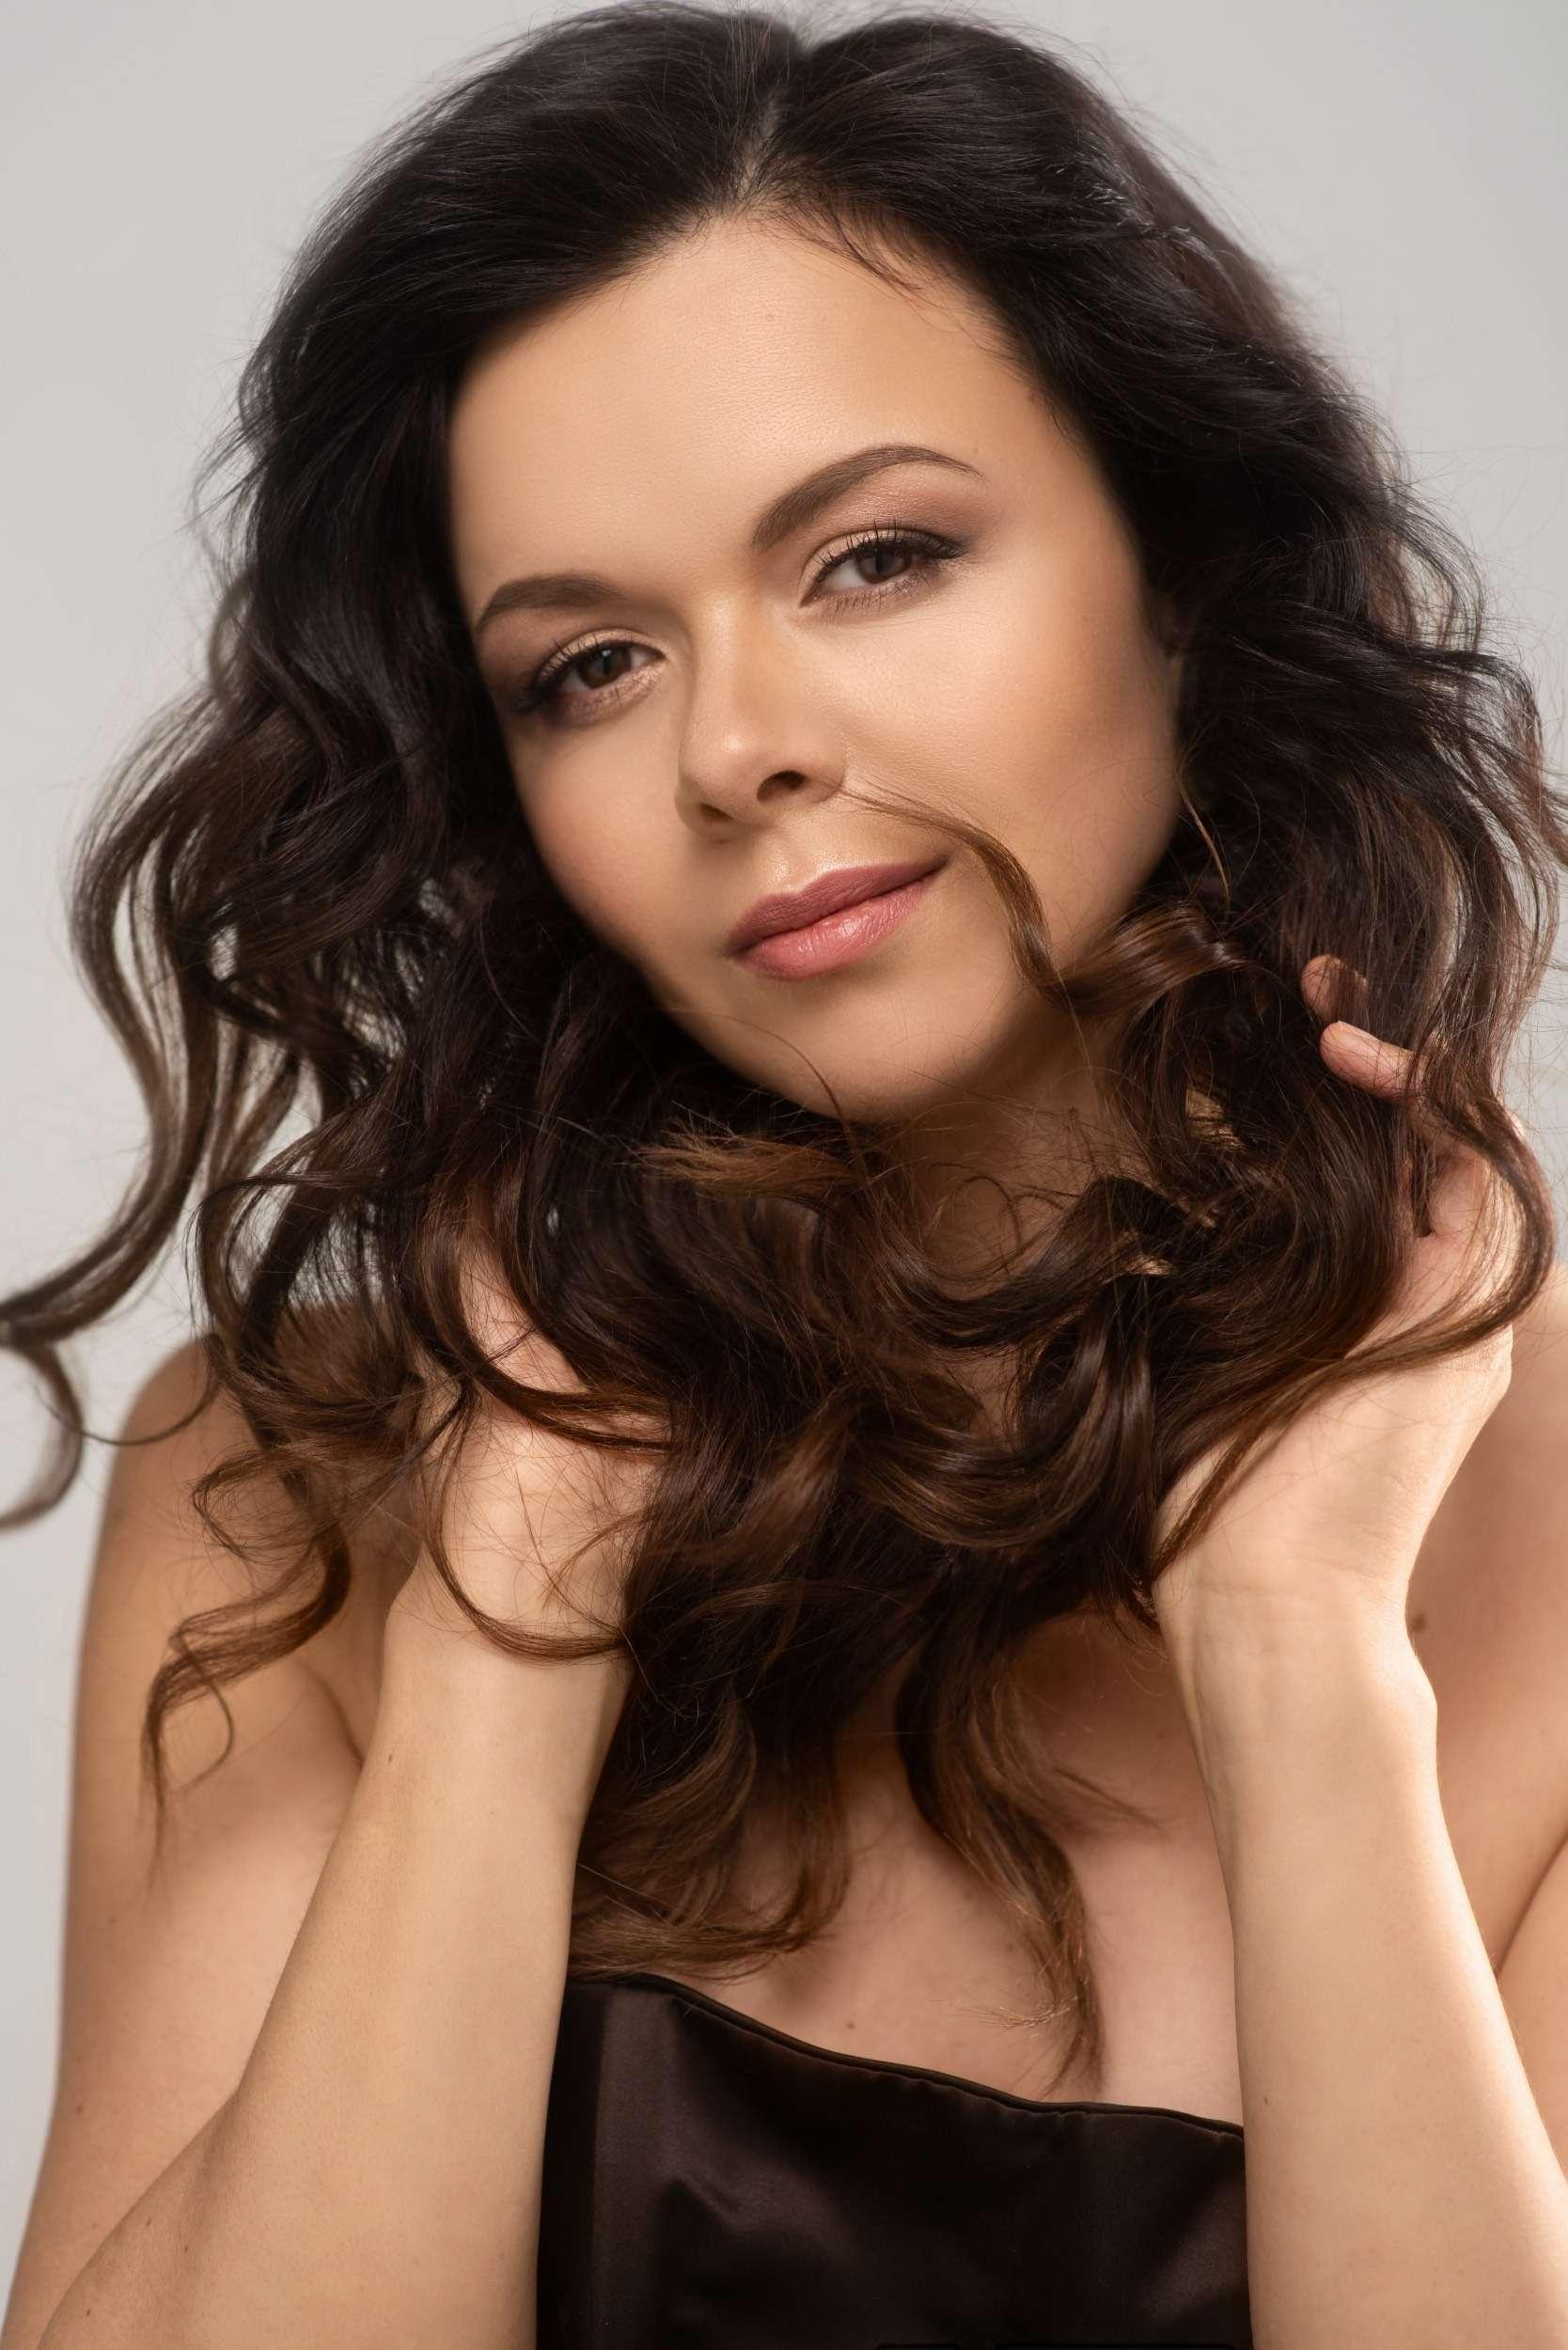 Nadezhda  Karyazina - Picture nr #63